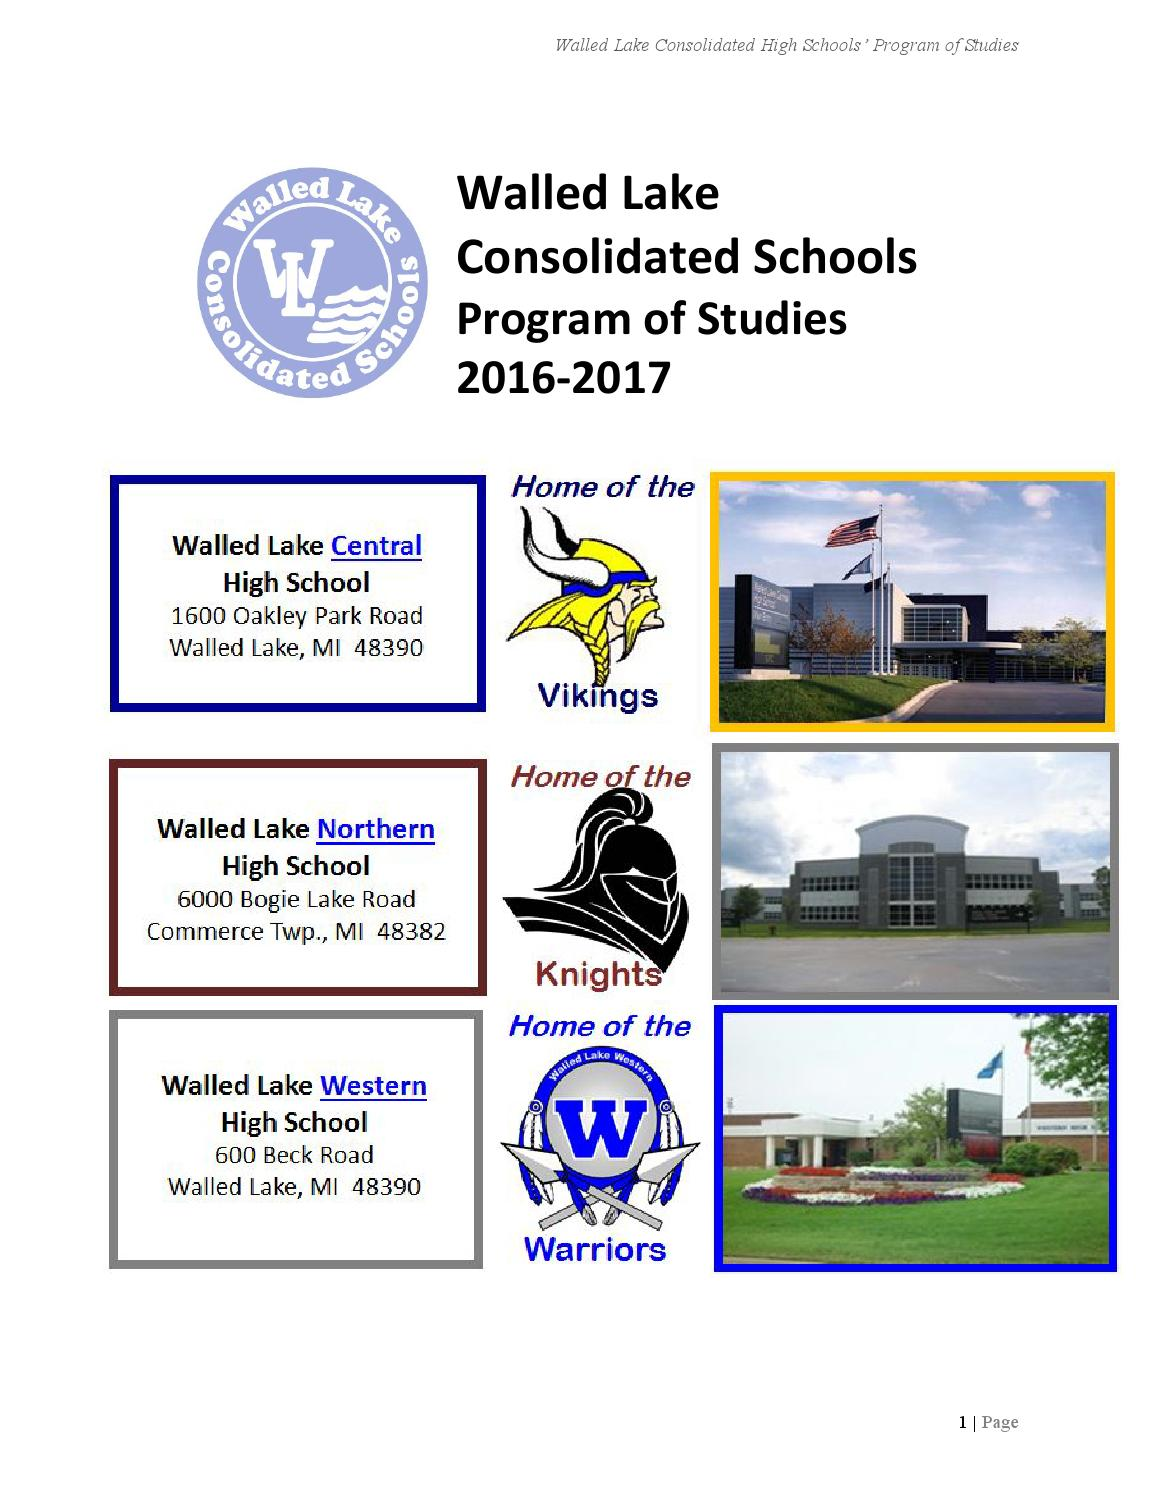 WLCSD High School Program of Studies for 2016-2017 by Mark Hess - Issuu